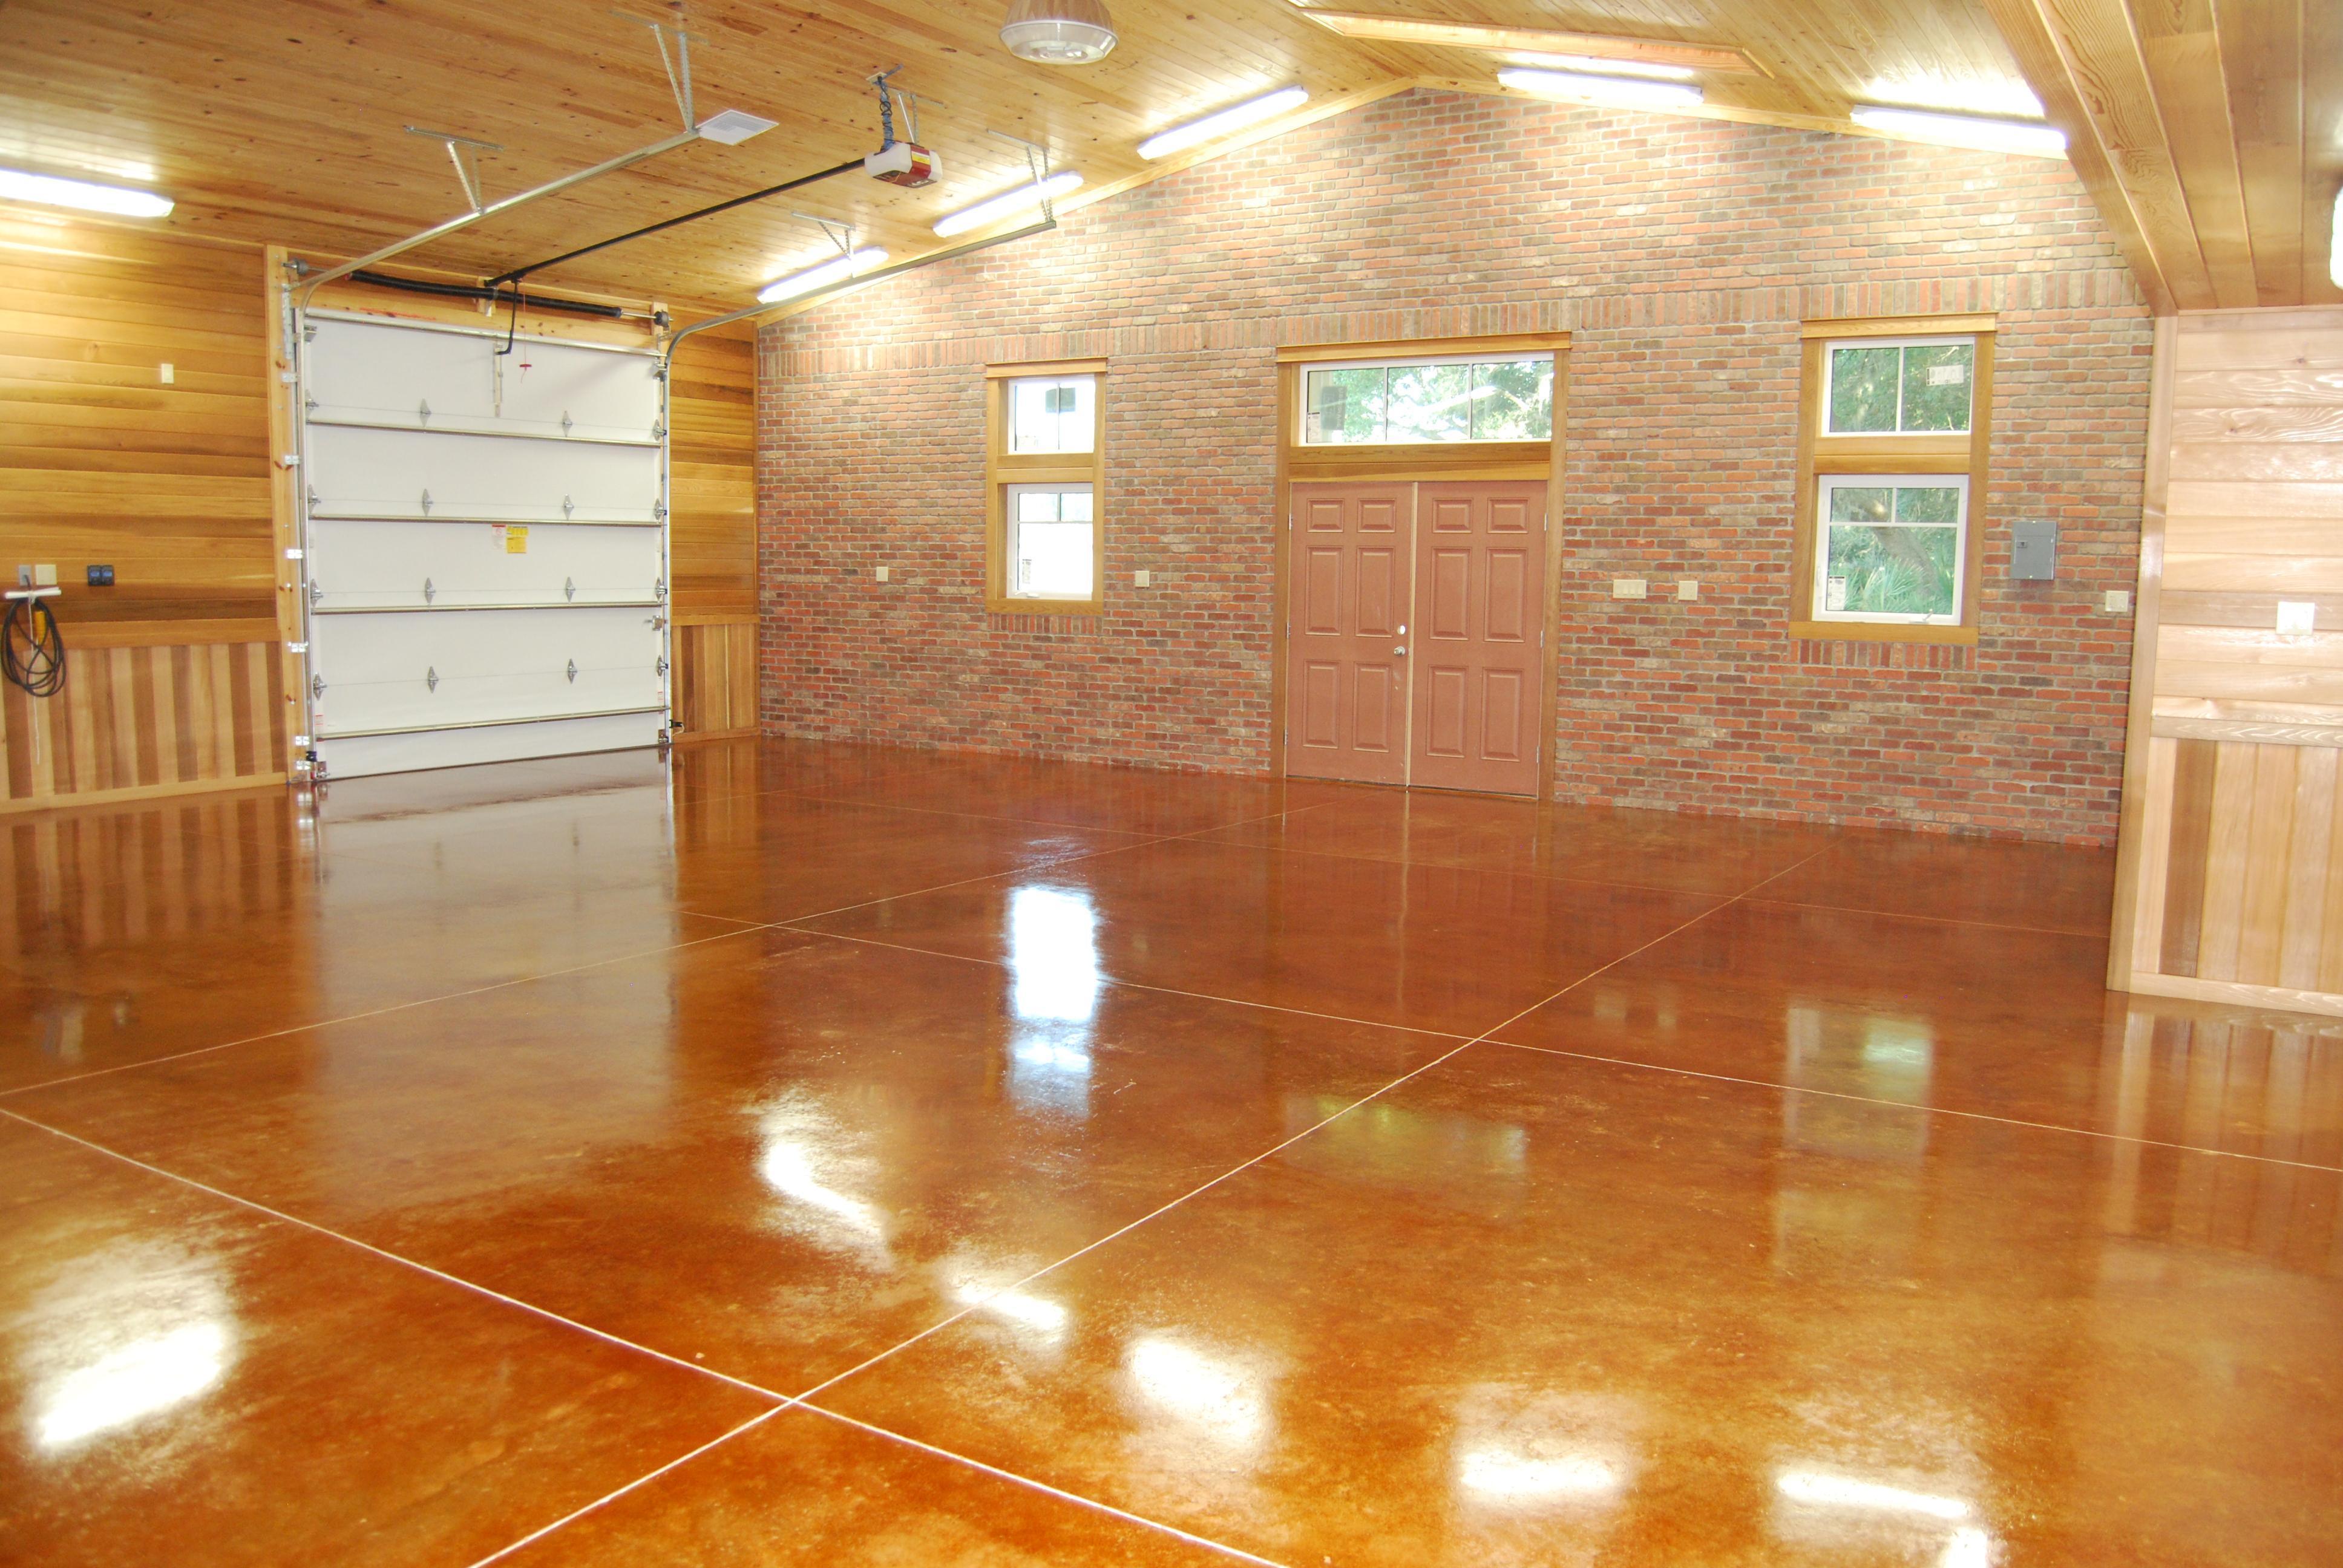 Flooring By Tile Experts Inc In Sarasota Fl 34237